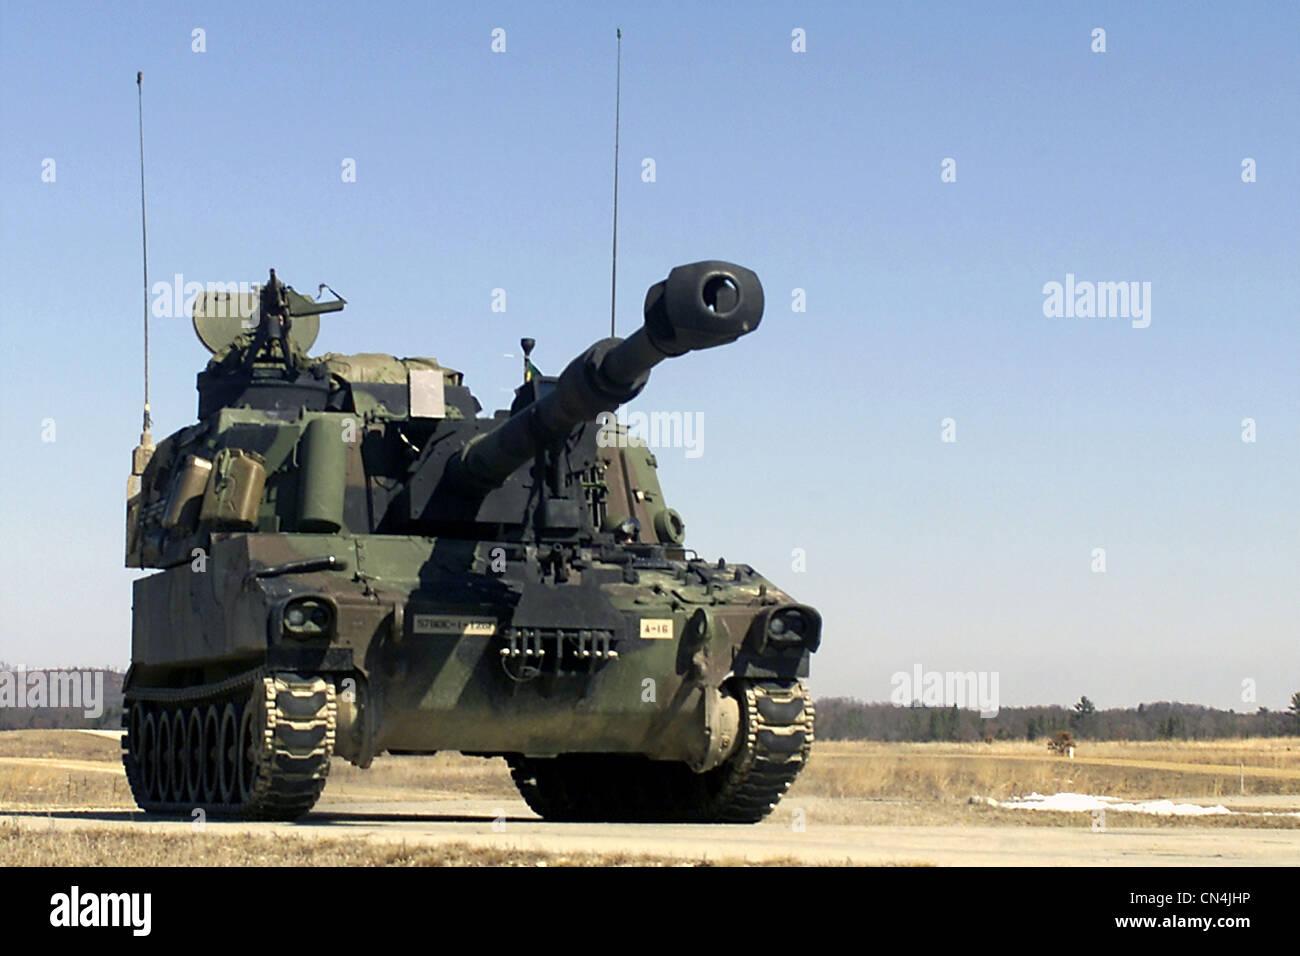 M109 howitzer - Wikipedia